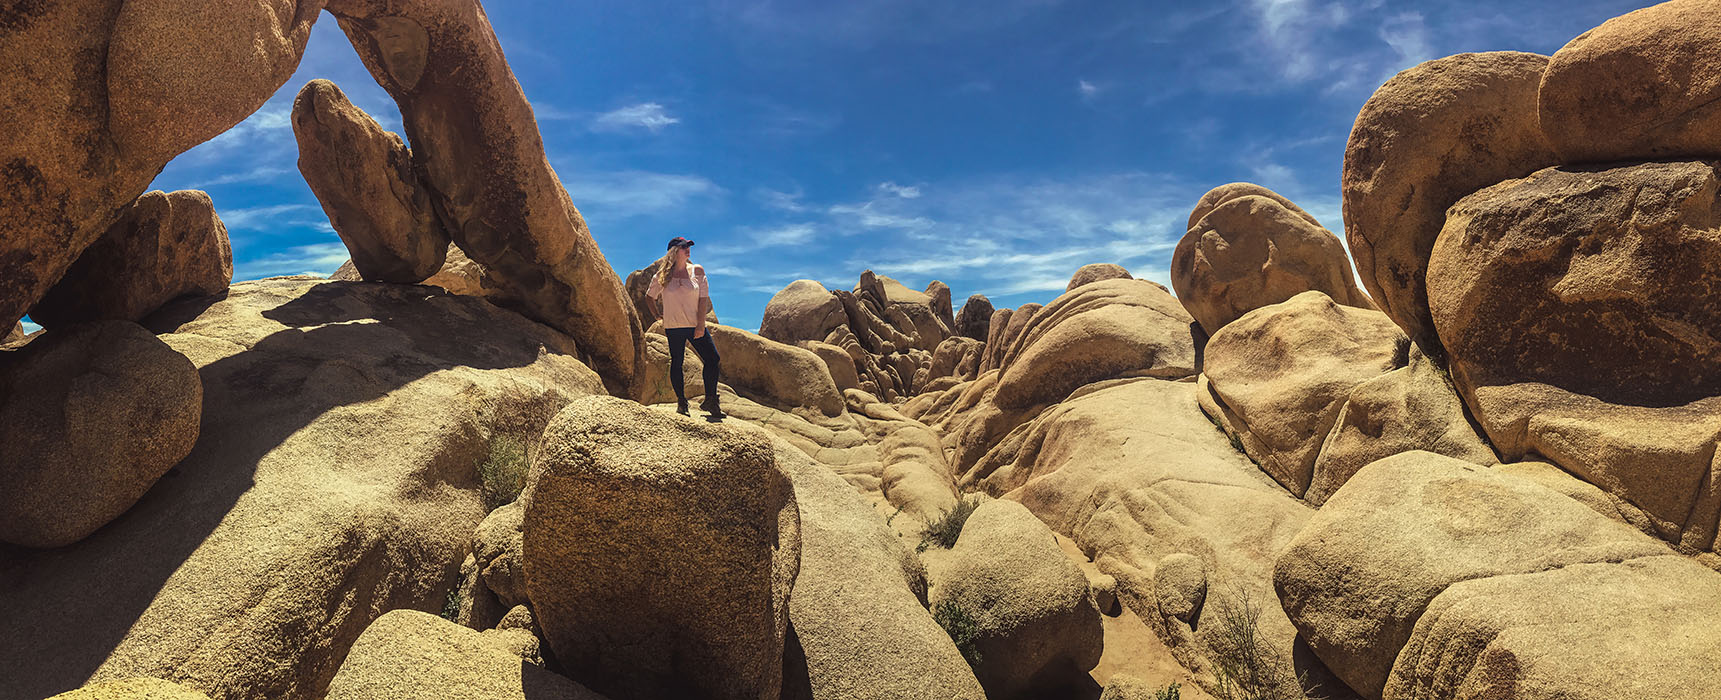 Joshua Tree National Park California Road Trip USA arch rock